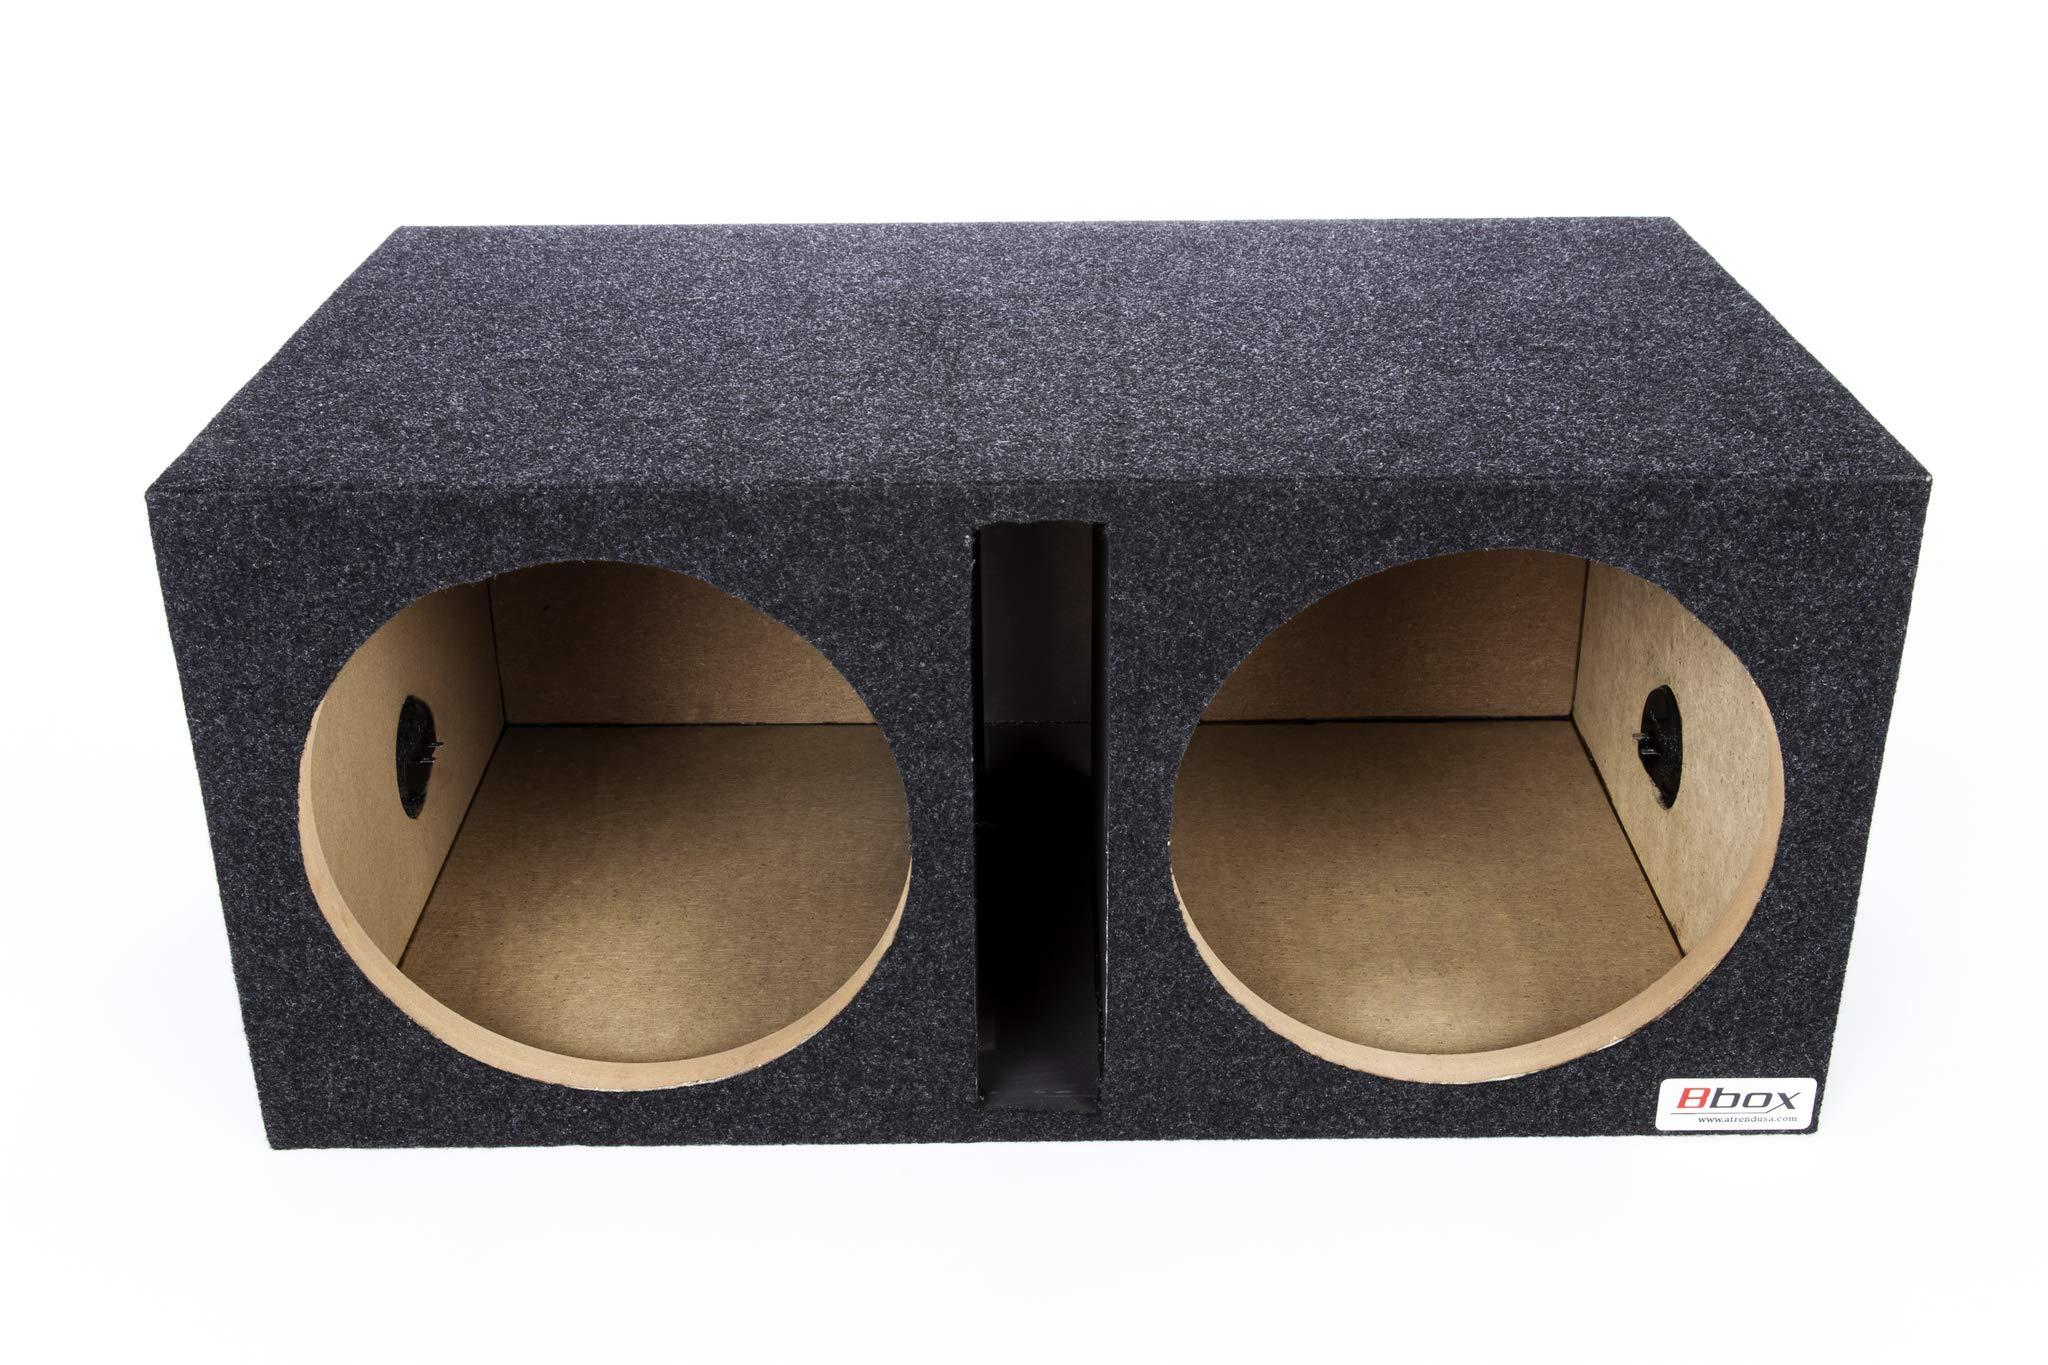 "Atrend Bbox E15DSV Pro-Series 15"" Dual Vented Subwoofer Enclosure, charcoal"